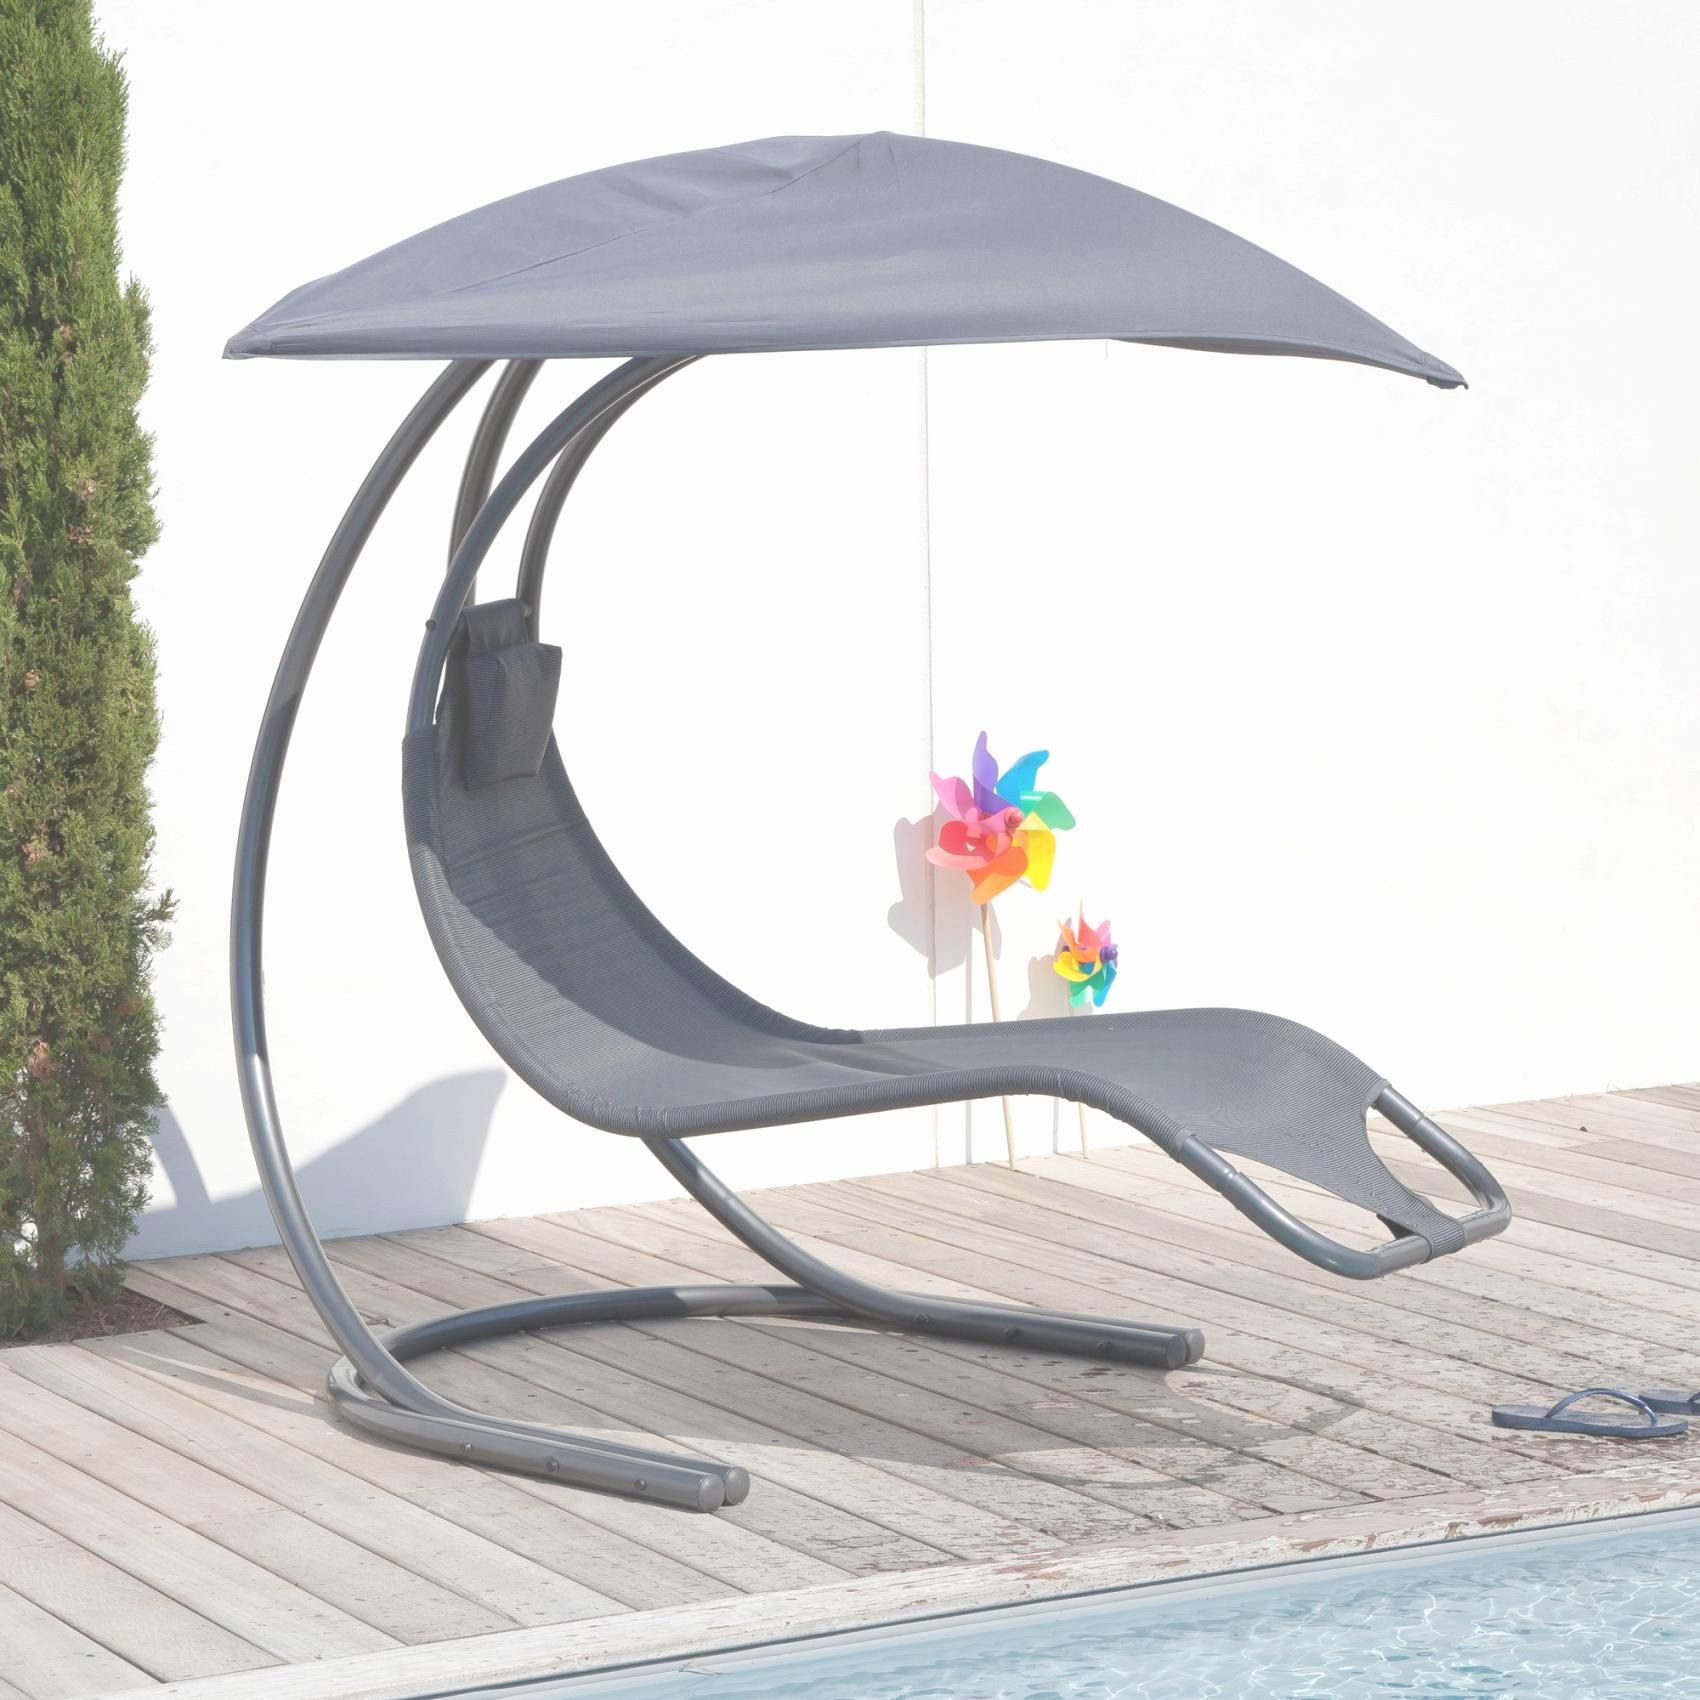 hamac leroy merlin fauteuil de jardin transat avec transat jardin leroy merlin unique s of hamac leroy merlin